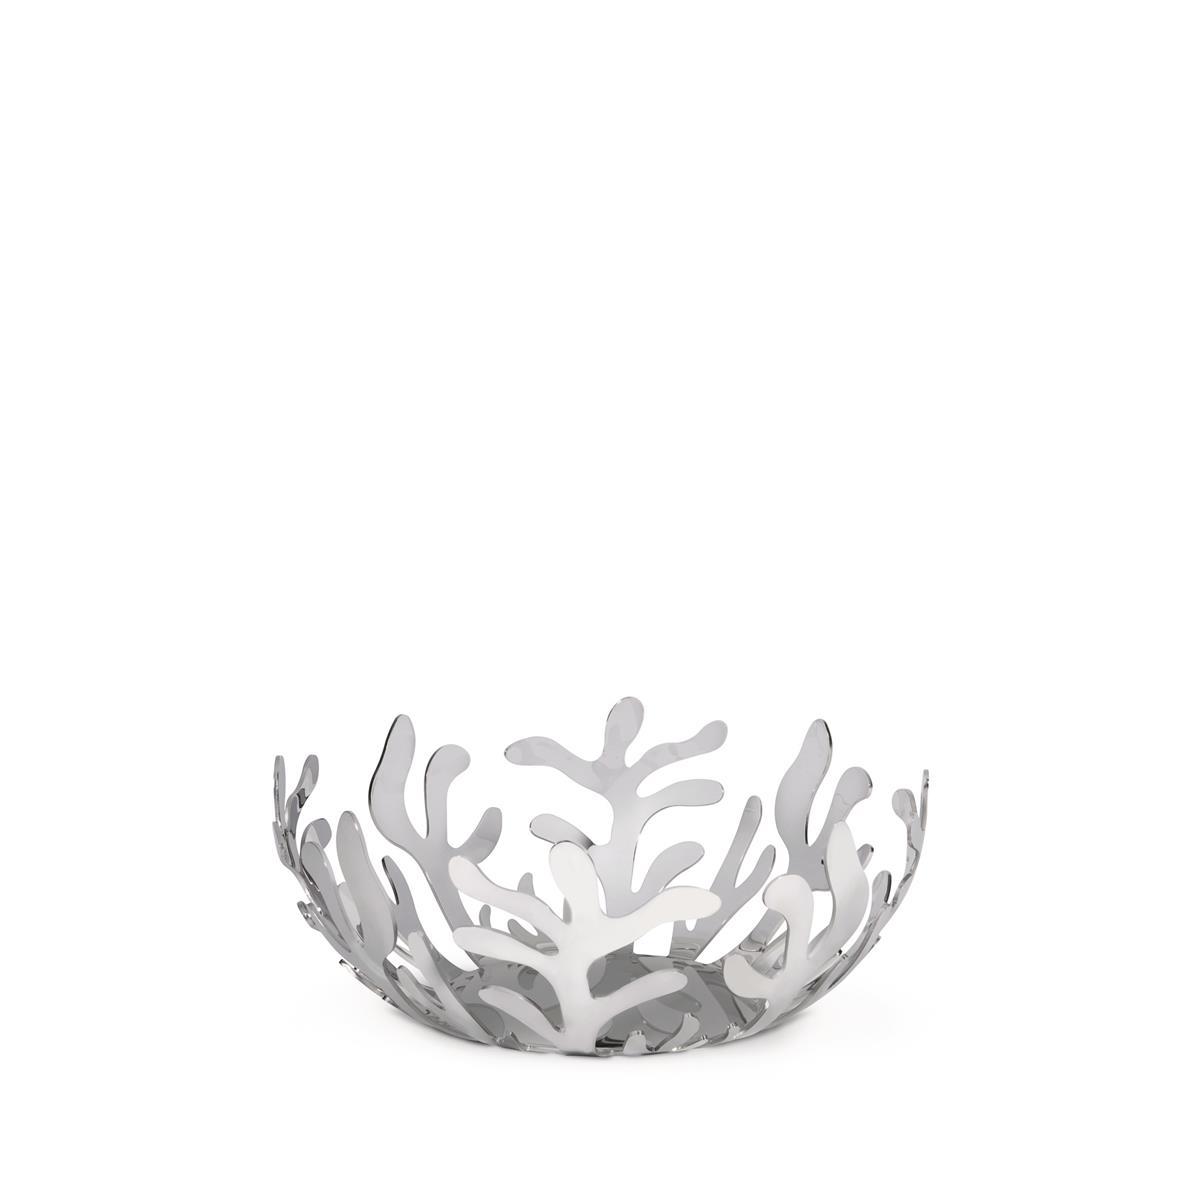 Alessi-Mediterraneo Fruit bowl in 18/10 stainless steel